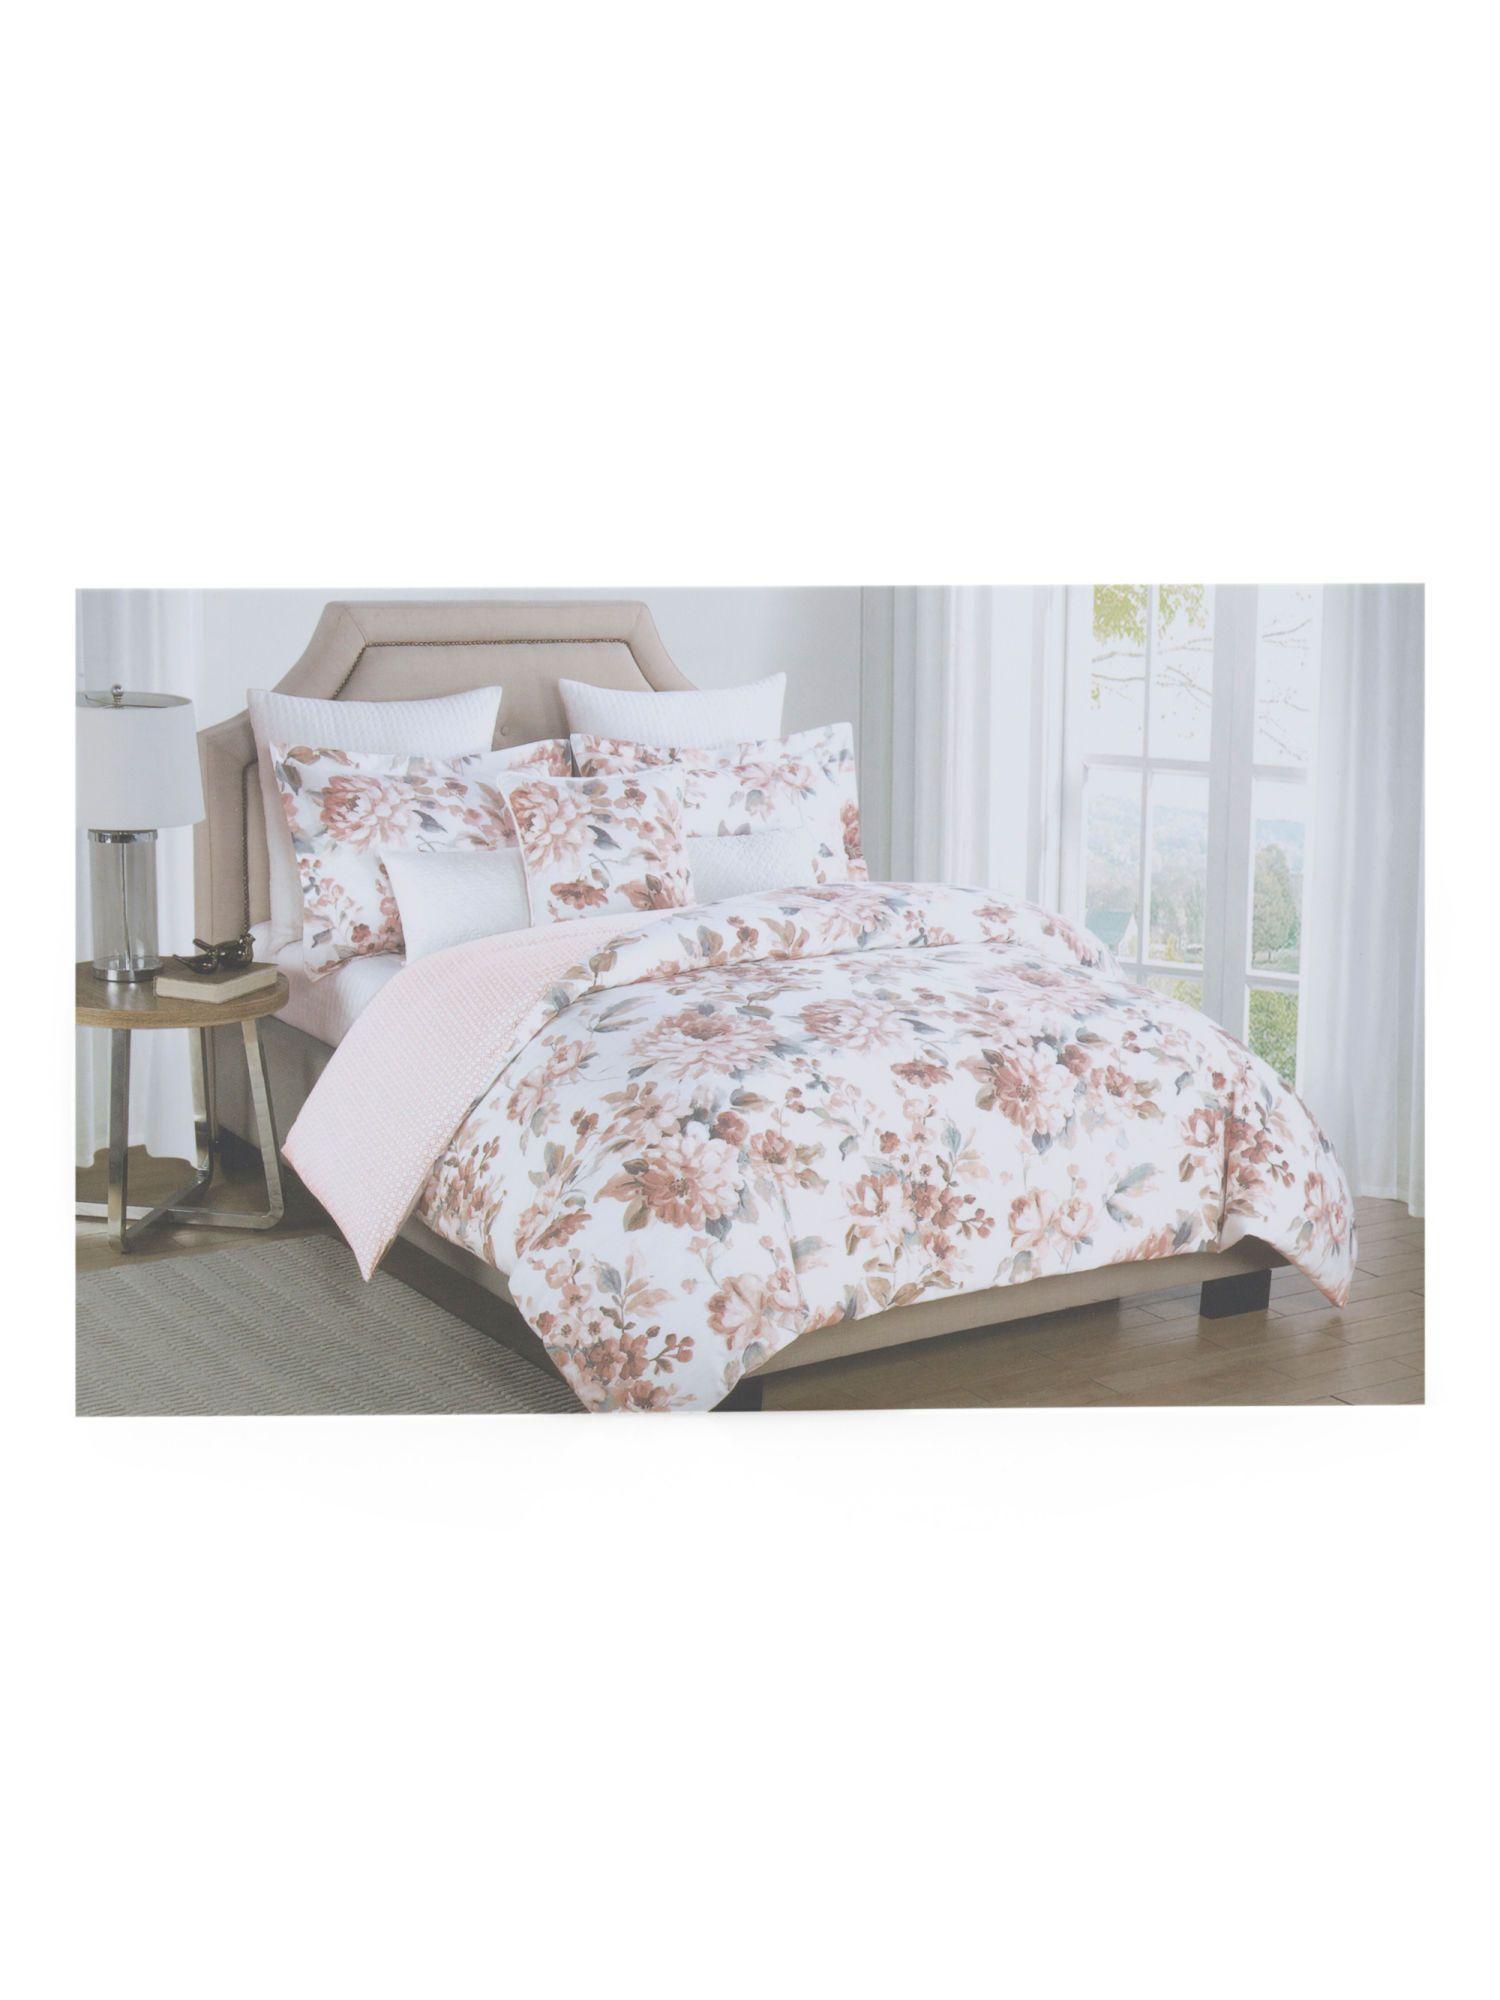 6pc Julius Comforter Set Comforters & Duvets T.J.Maxx